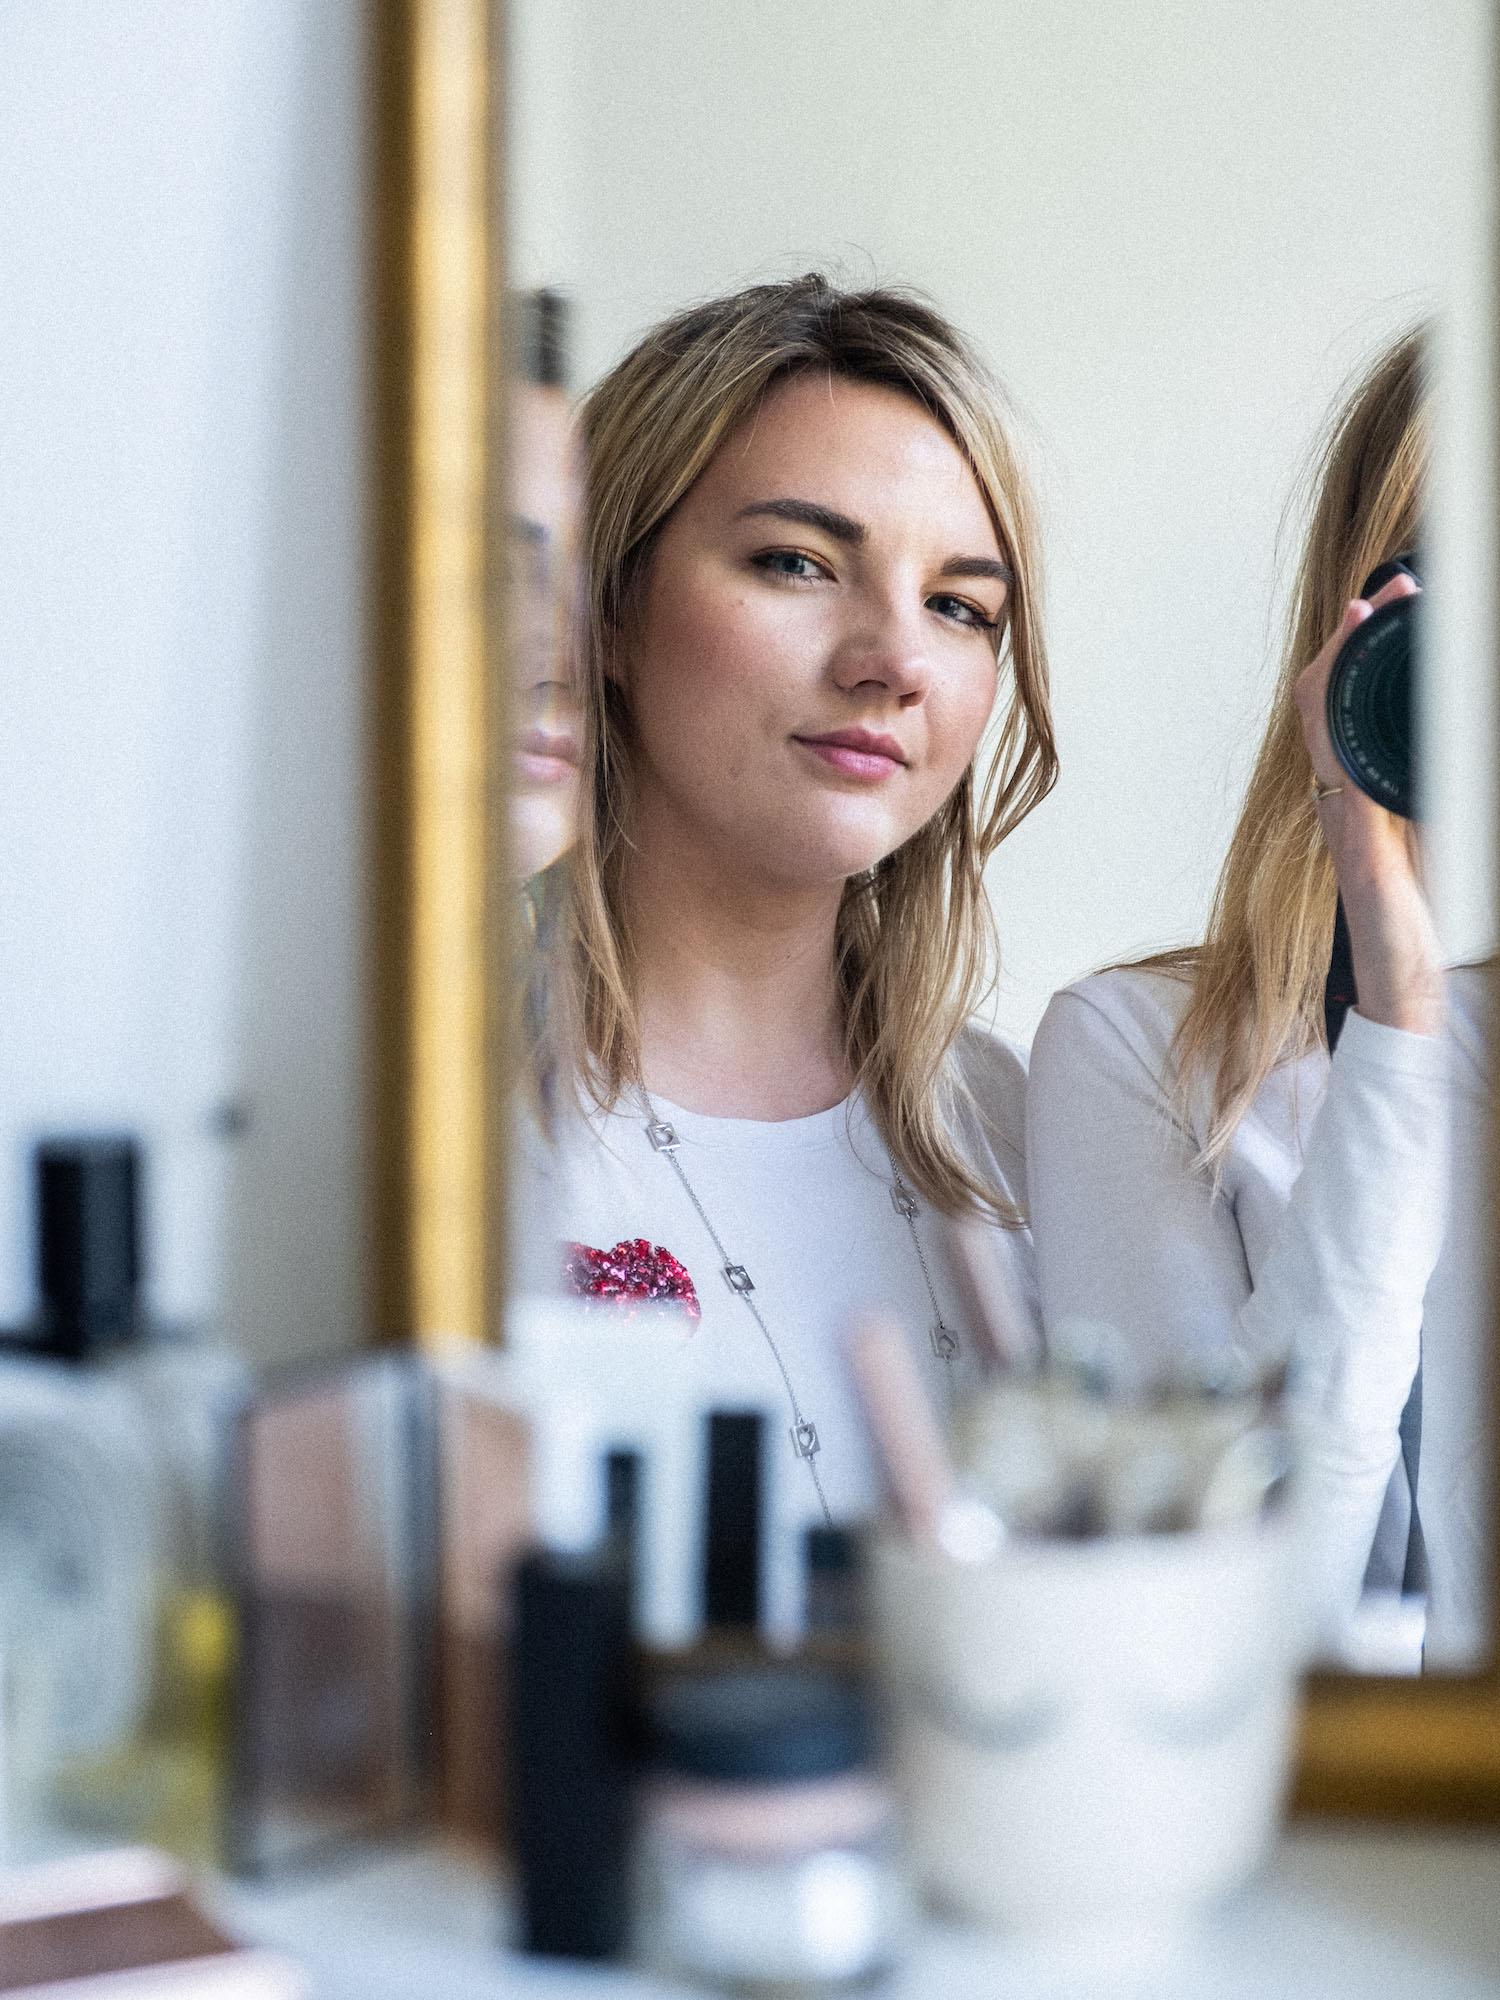 Beautyblog Bare Minds Anna-Luisa Glenn 4